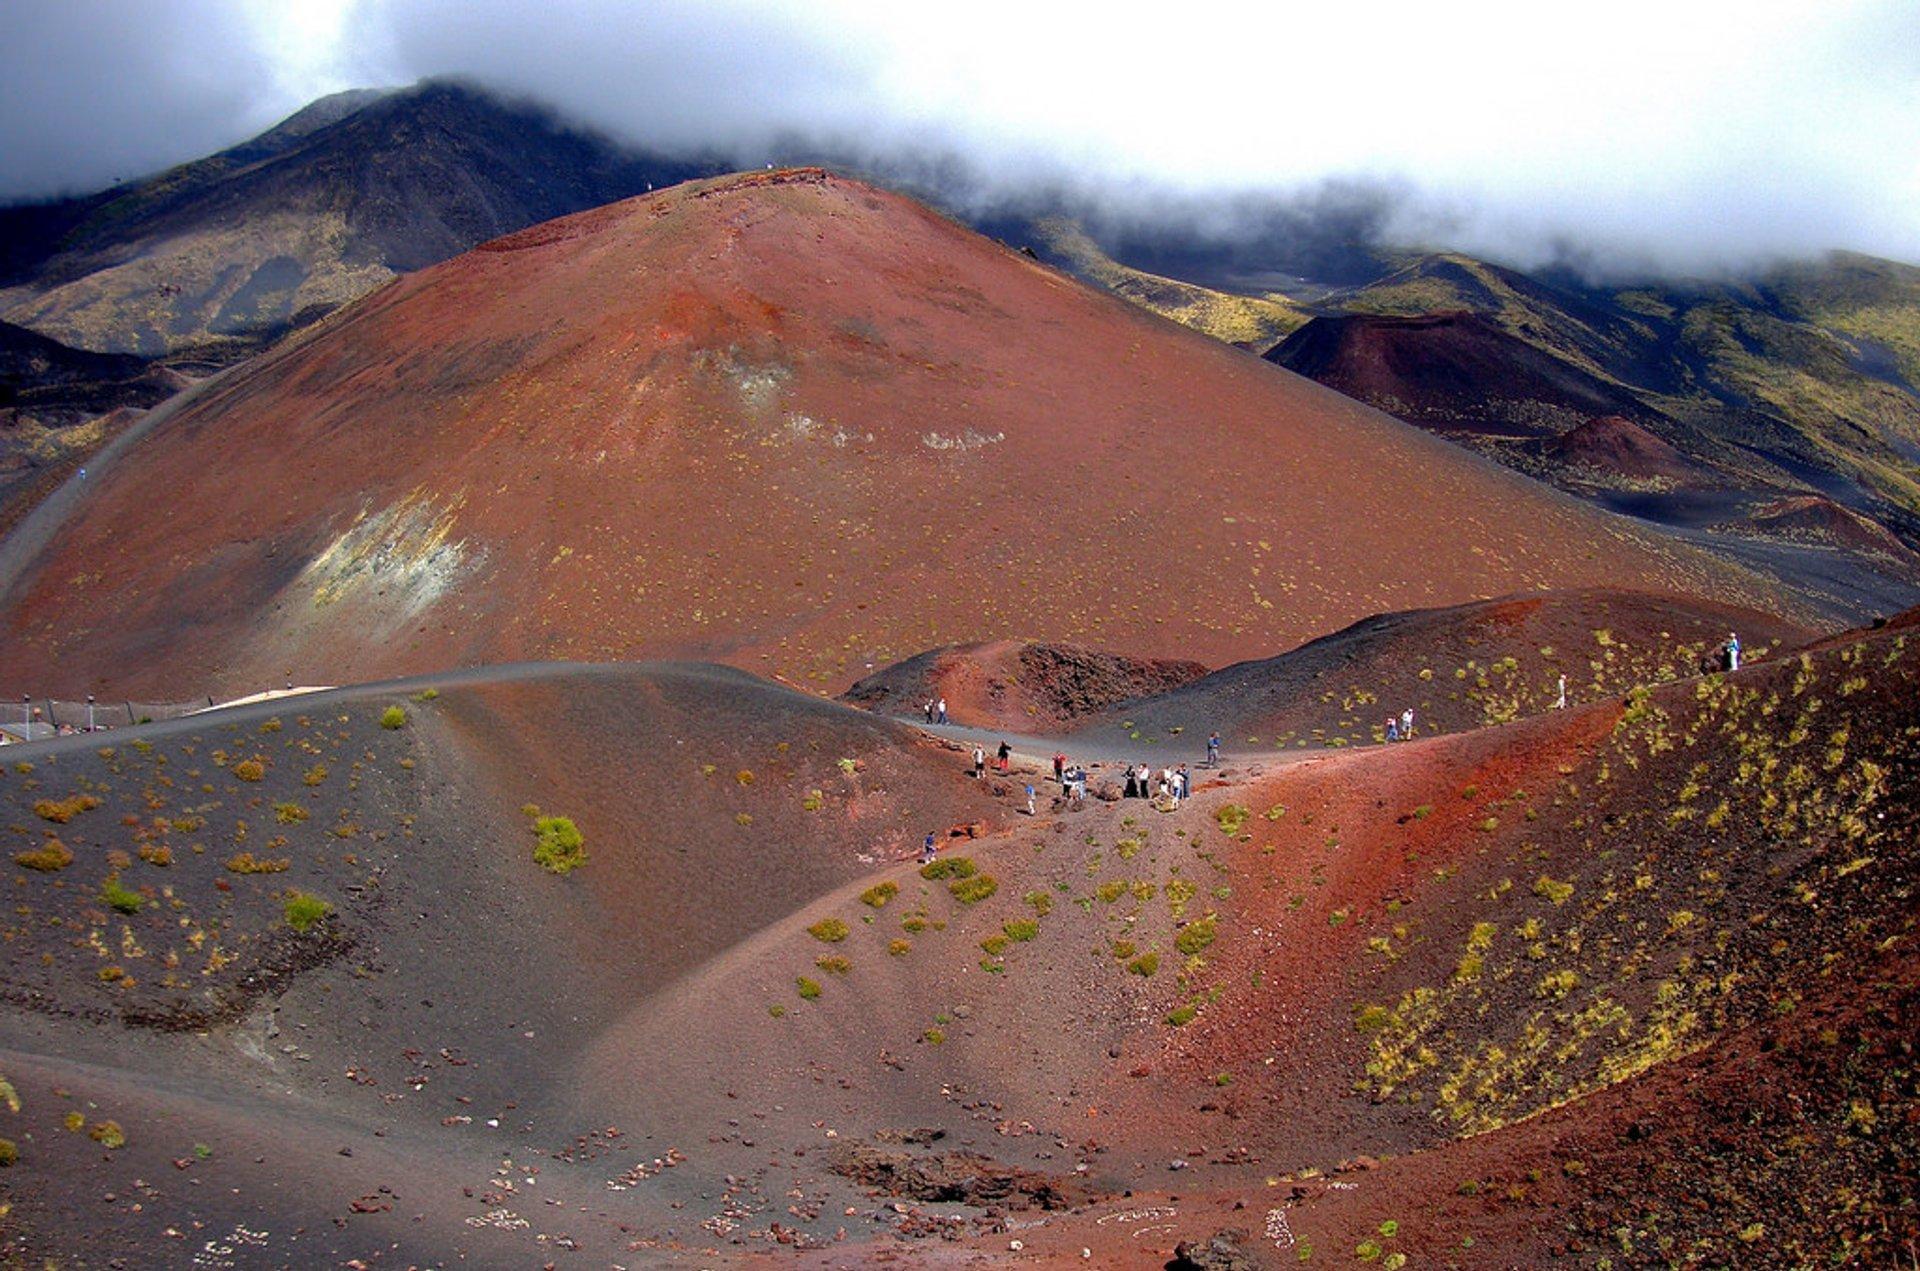 A Walk around Mount Etna in Sicily 2020 - Best Time